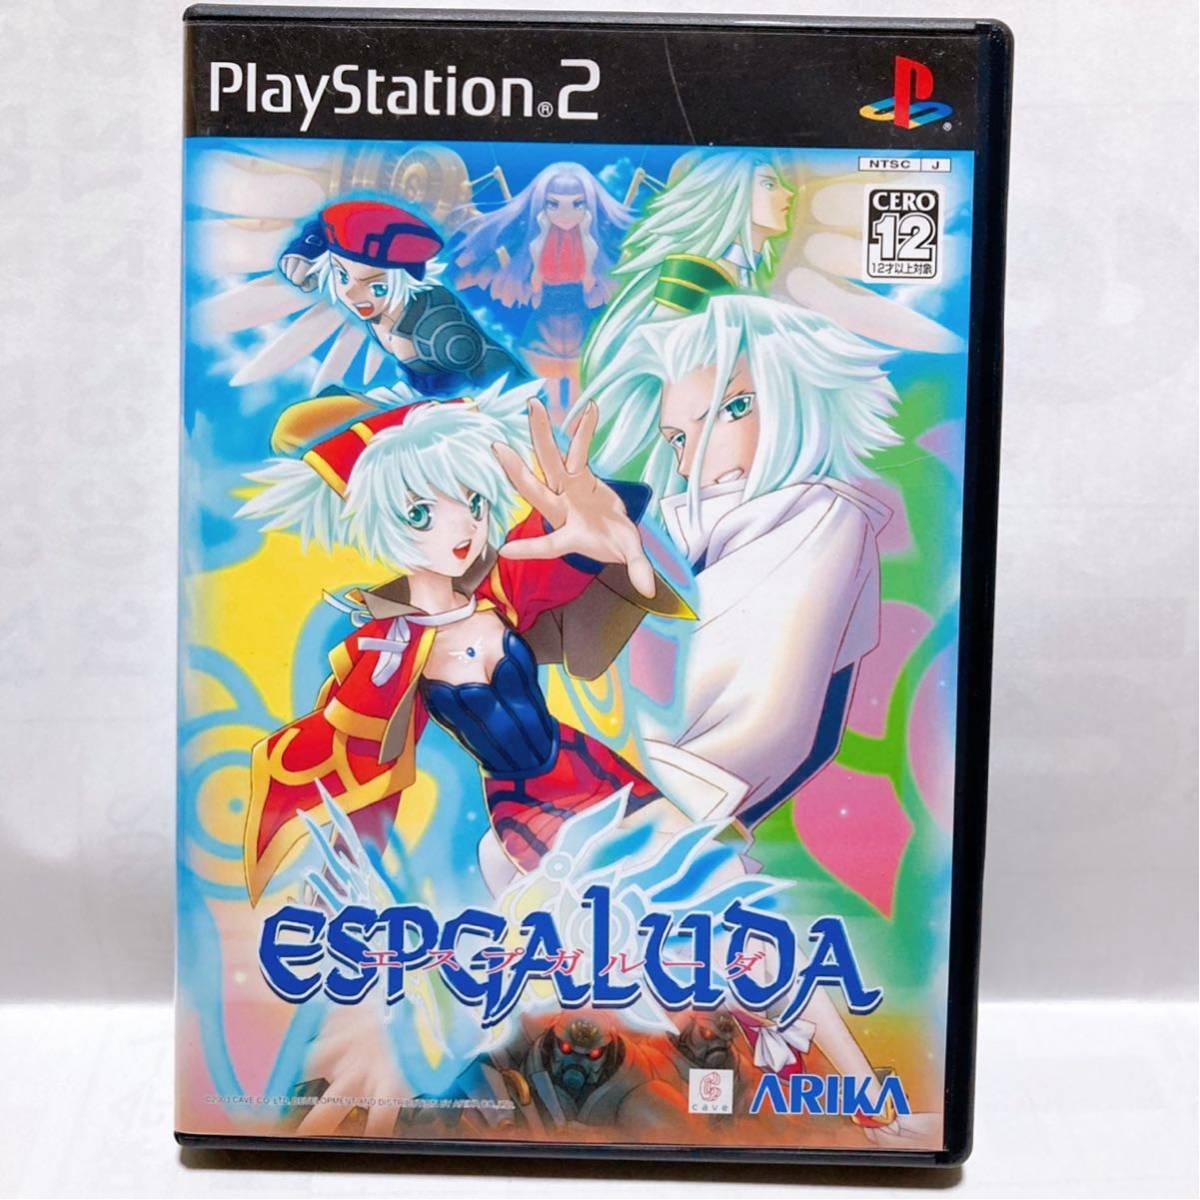 PS2 エスプガルーダ 【プレイステーション2 プレステ2 ESPGALUDA】特典DVD付